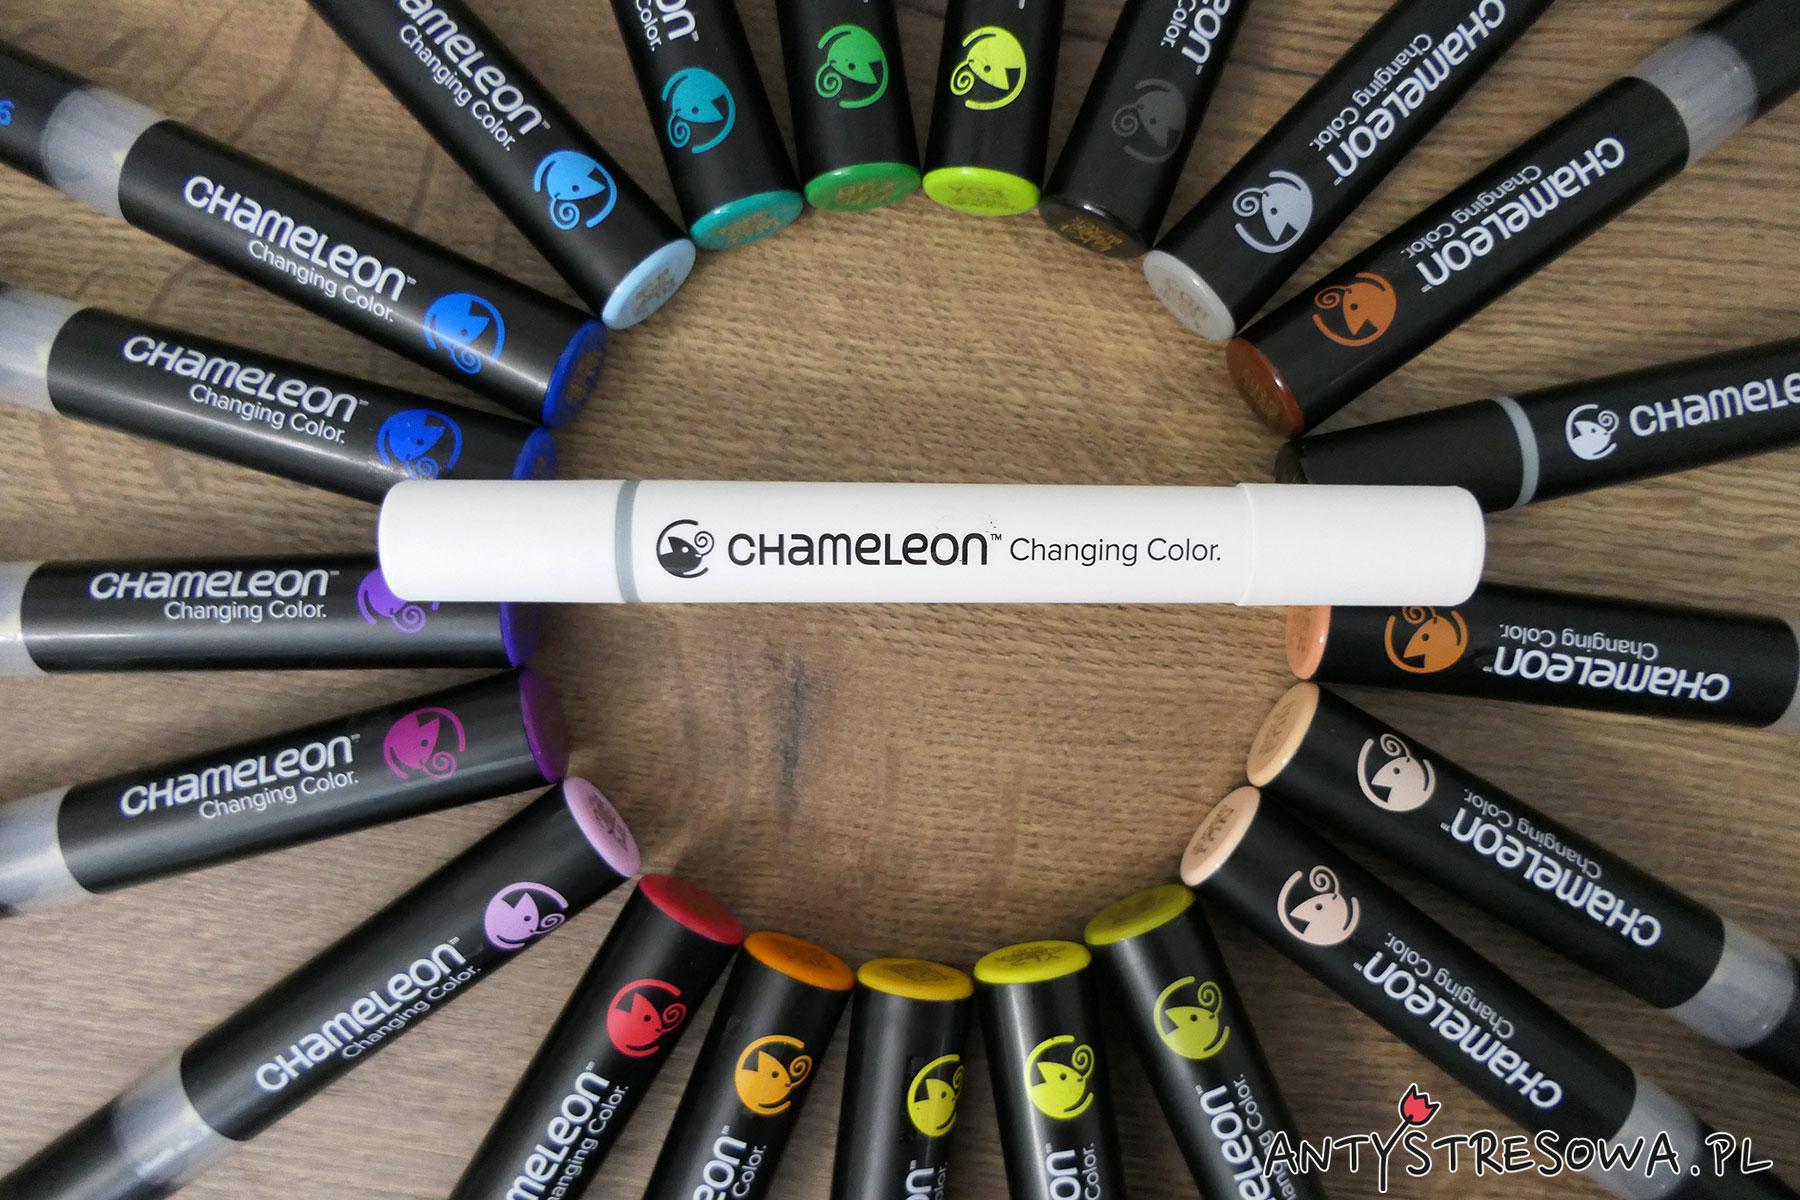 Markery Chameleon 22 sztuki, w tym blender i cienkopis